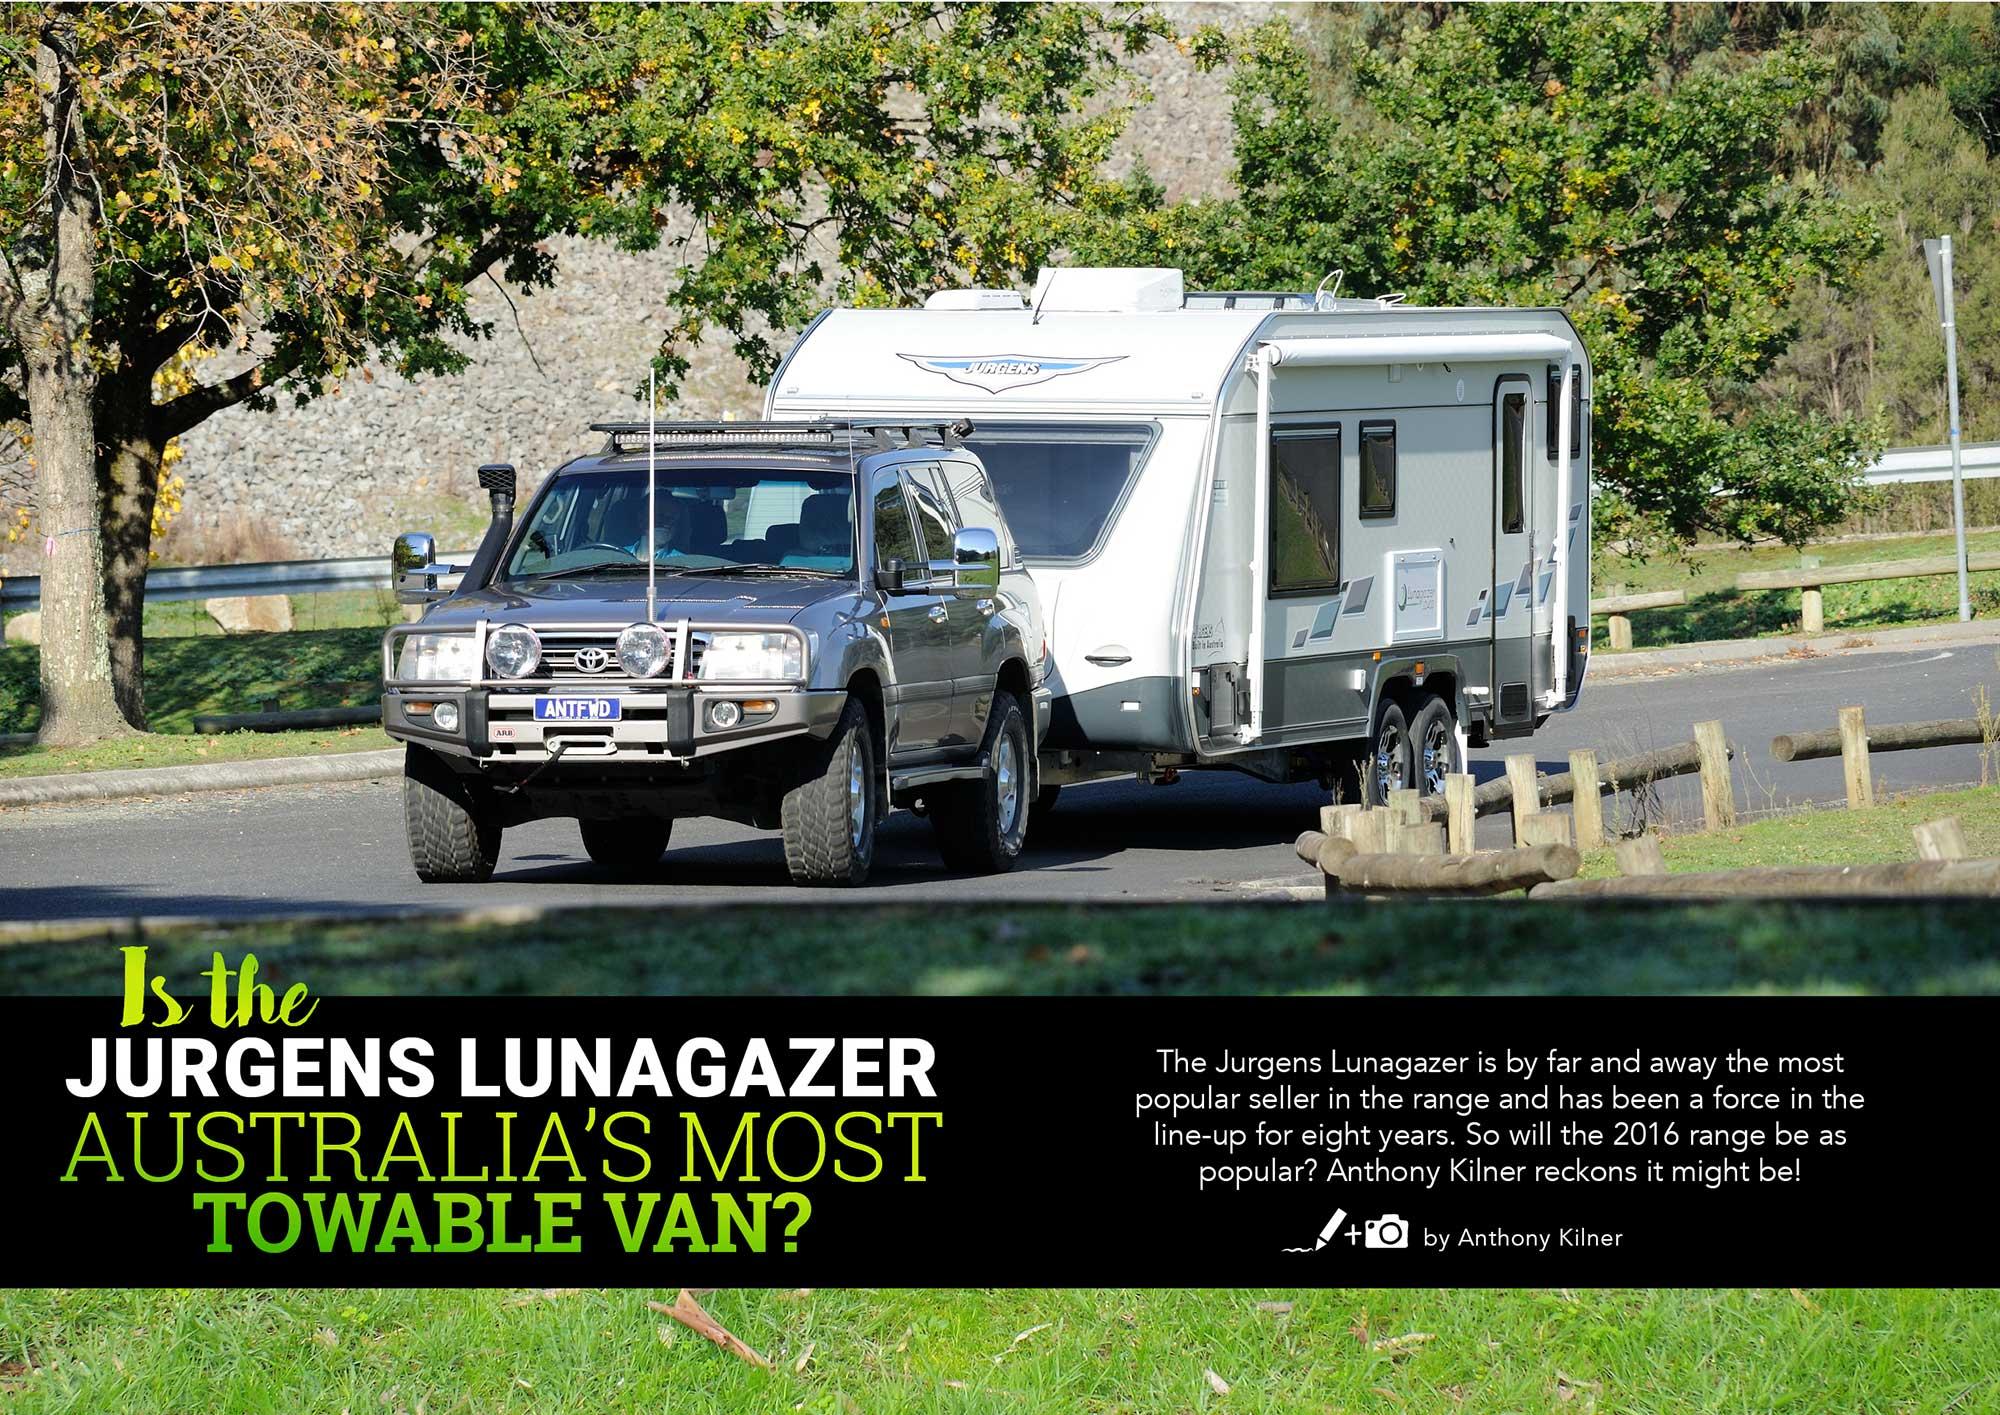 Is the Jurgens Lunagazer Australia's Most Towable Van?